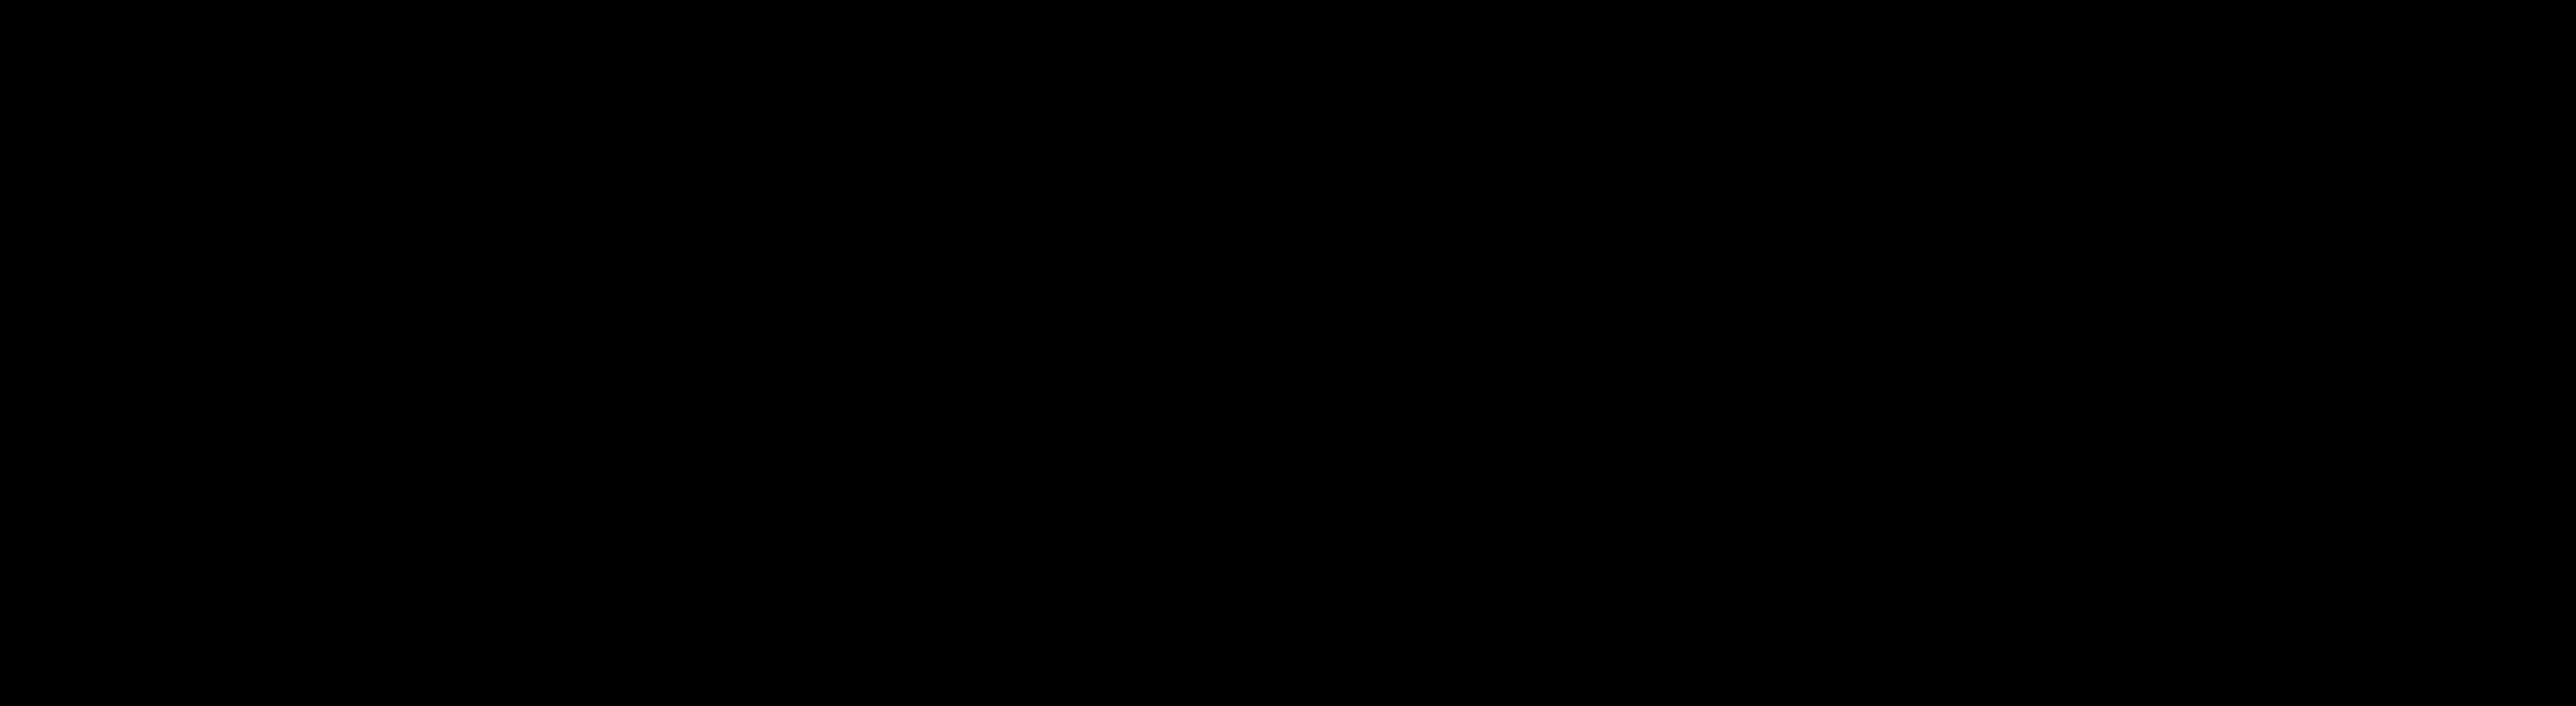 MTSEA Biotin-X